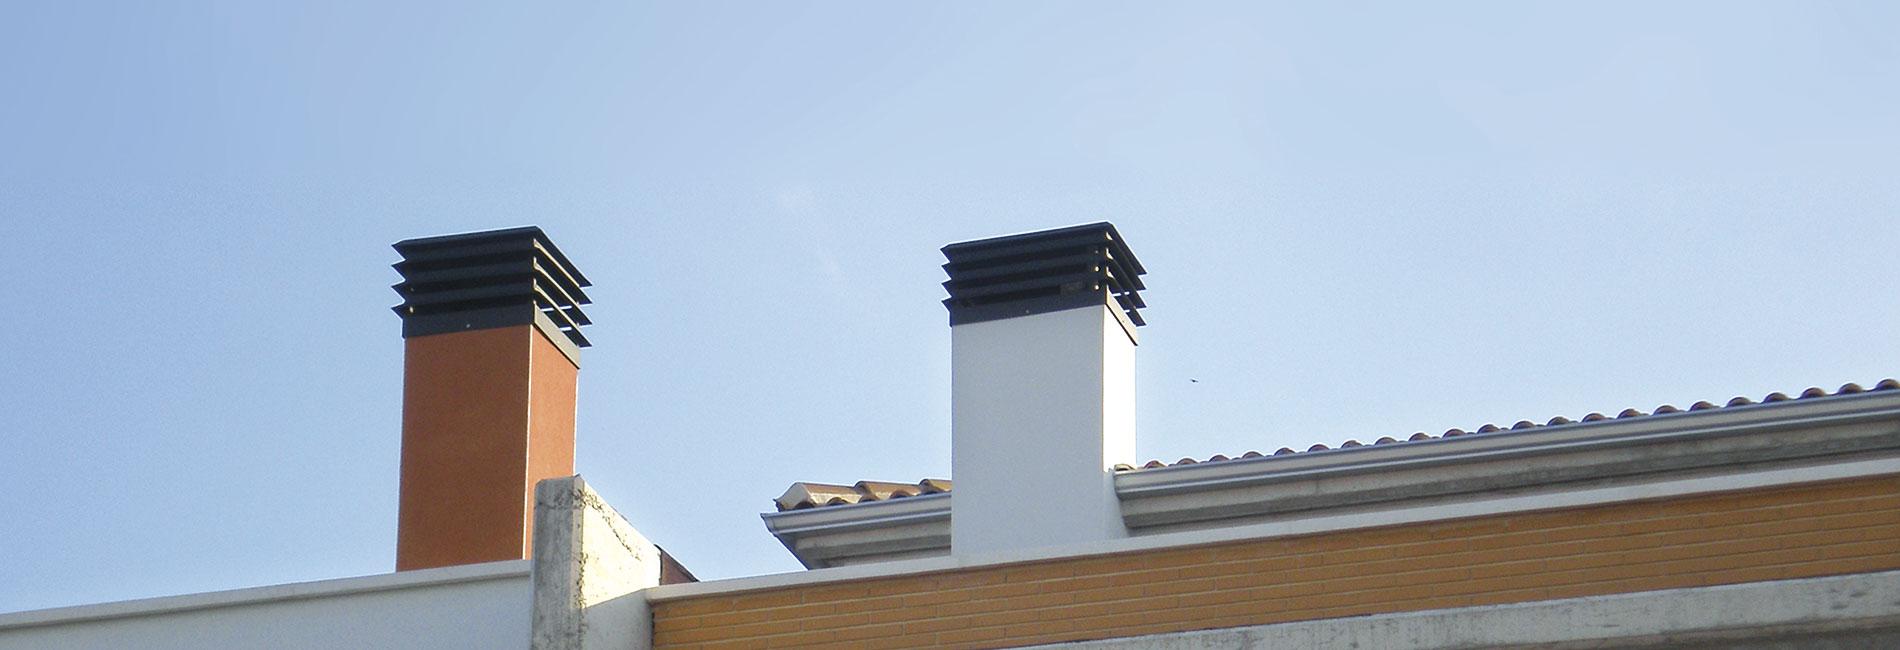 Remates de chimenea fabricados